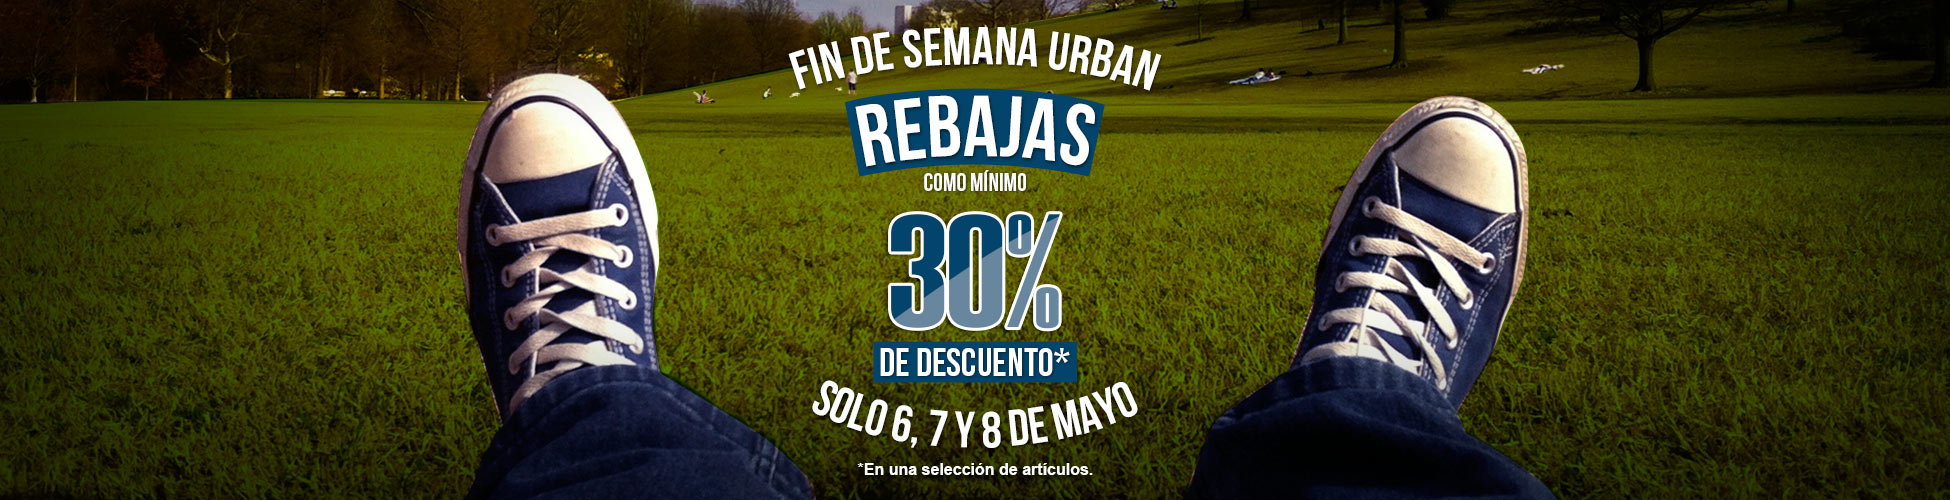 Fin de Semana Urban ES